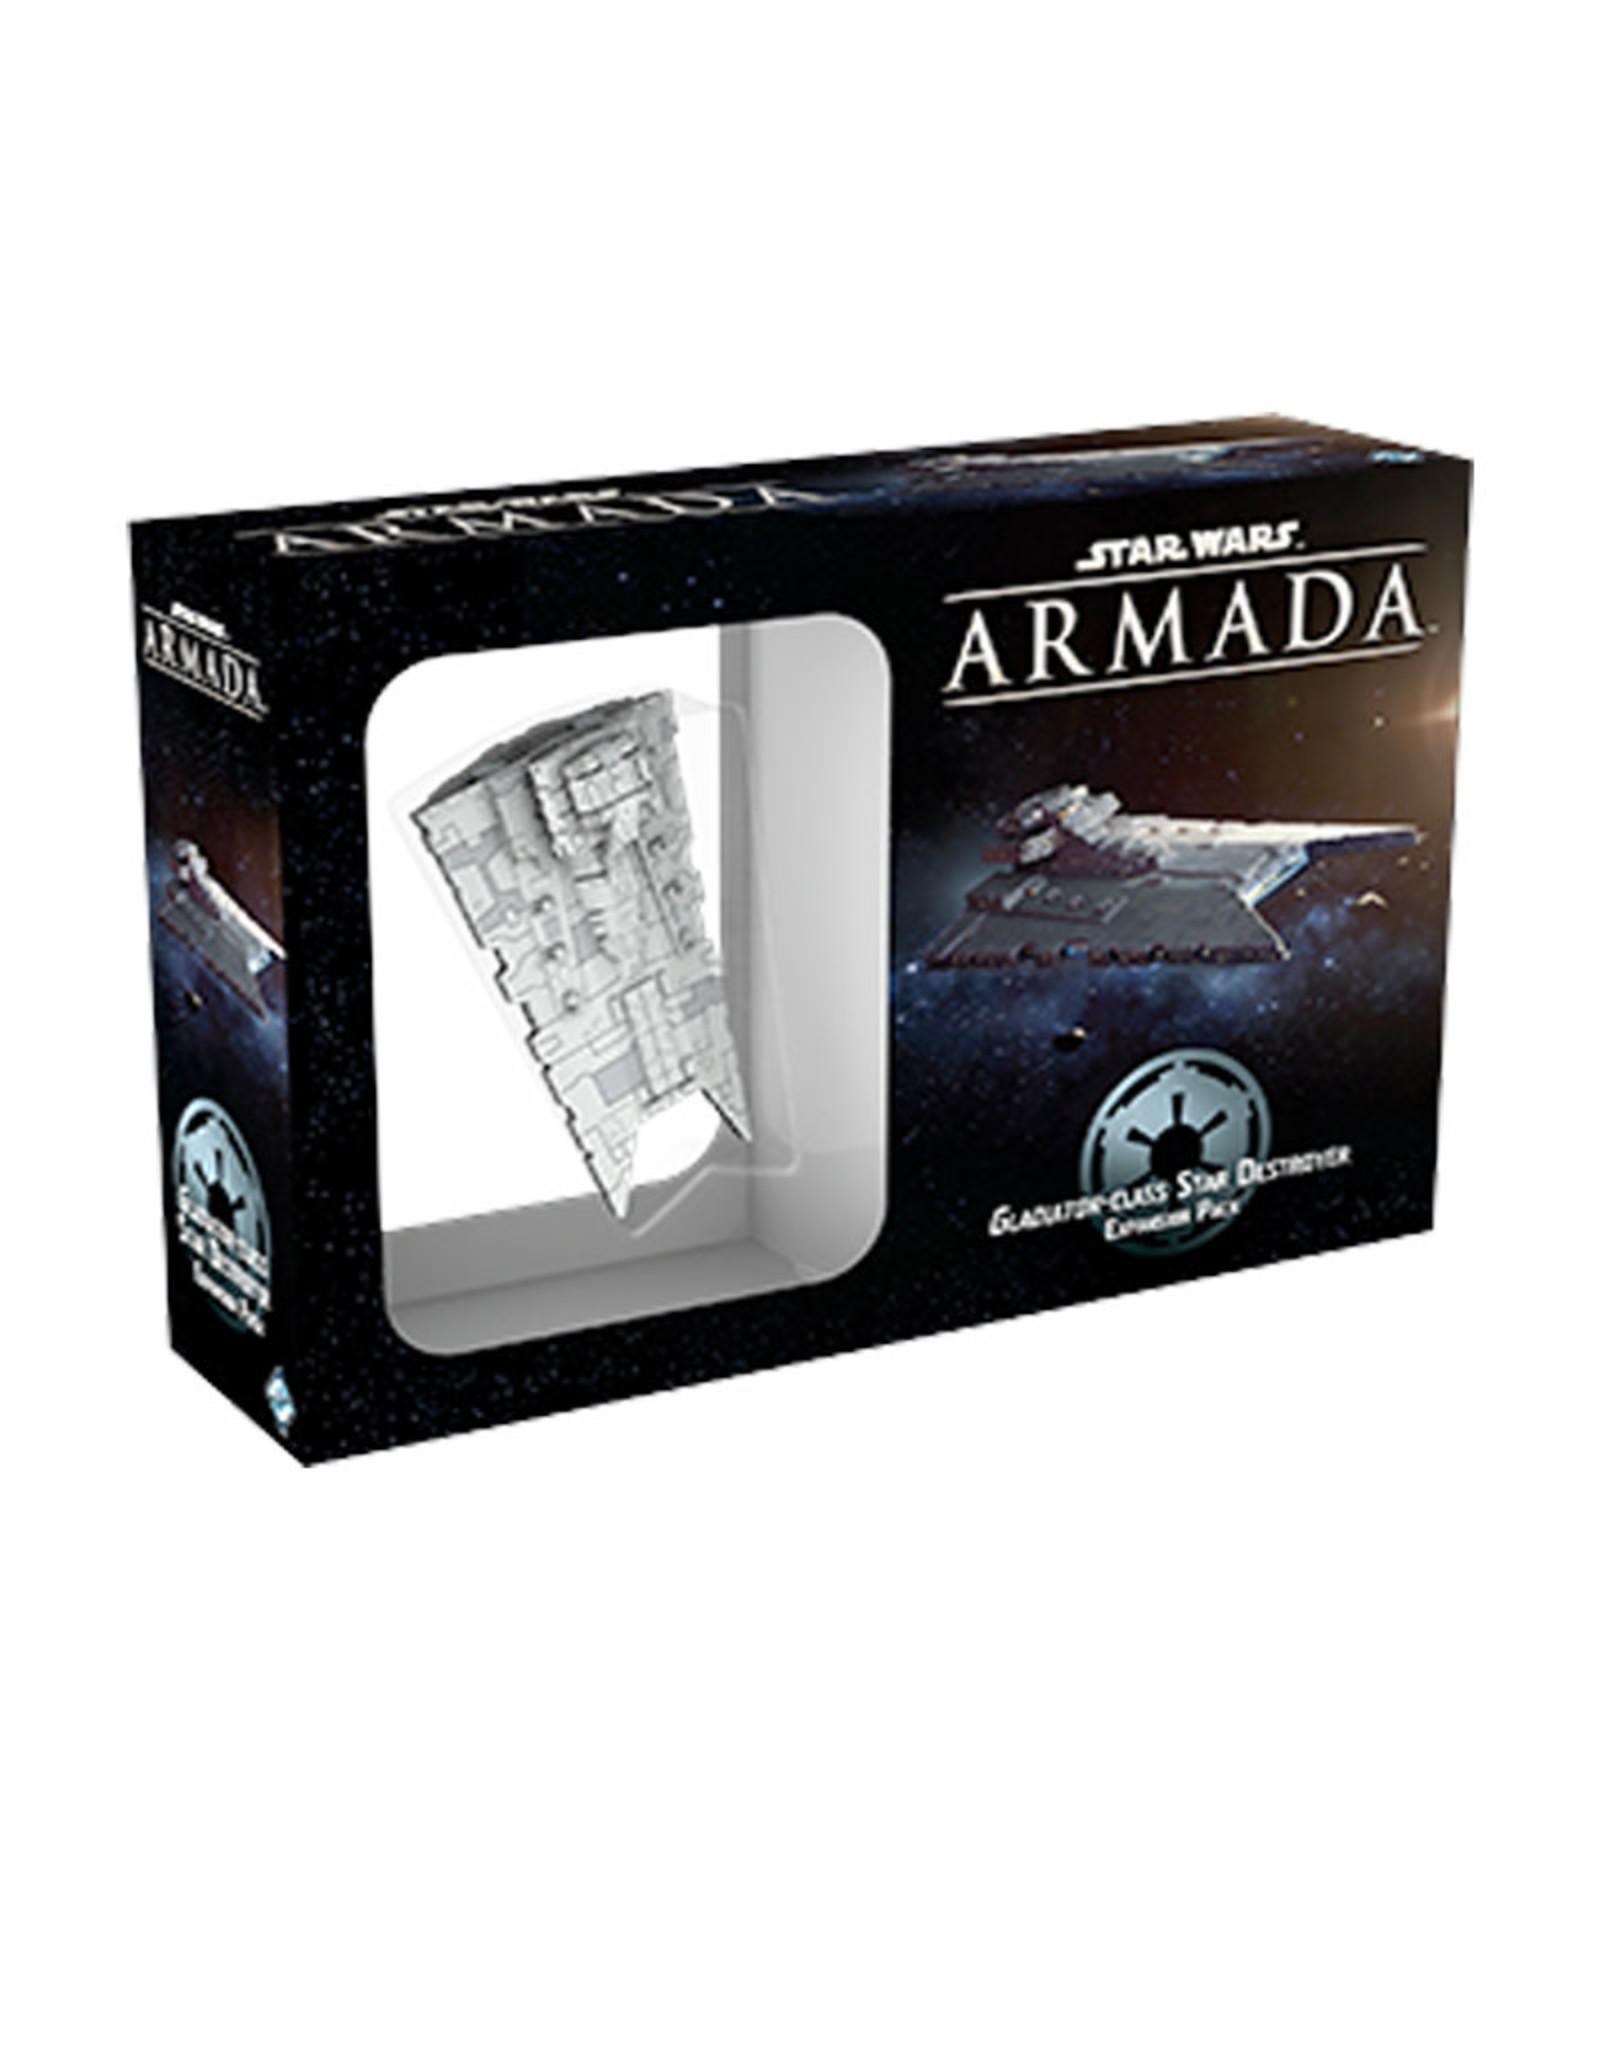 Fantasy Flight Games Star Wars Armada: Gladiator-class Star Destroyer Expansion Pack